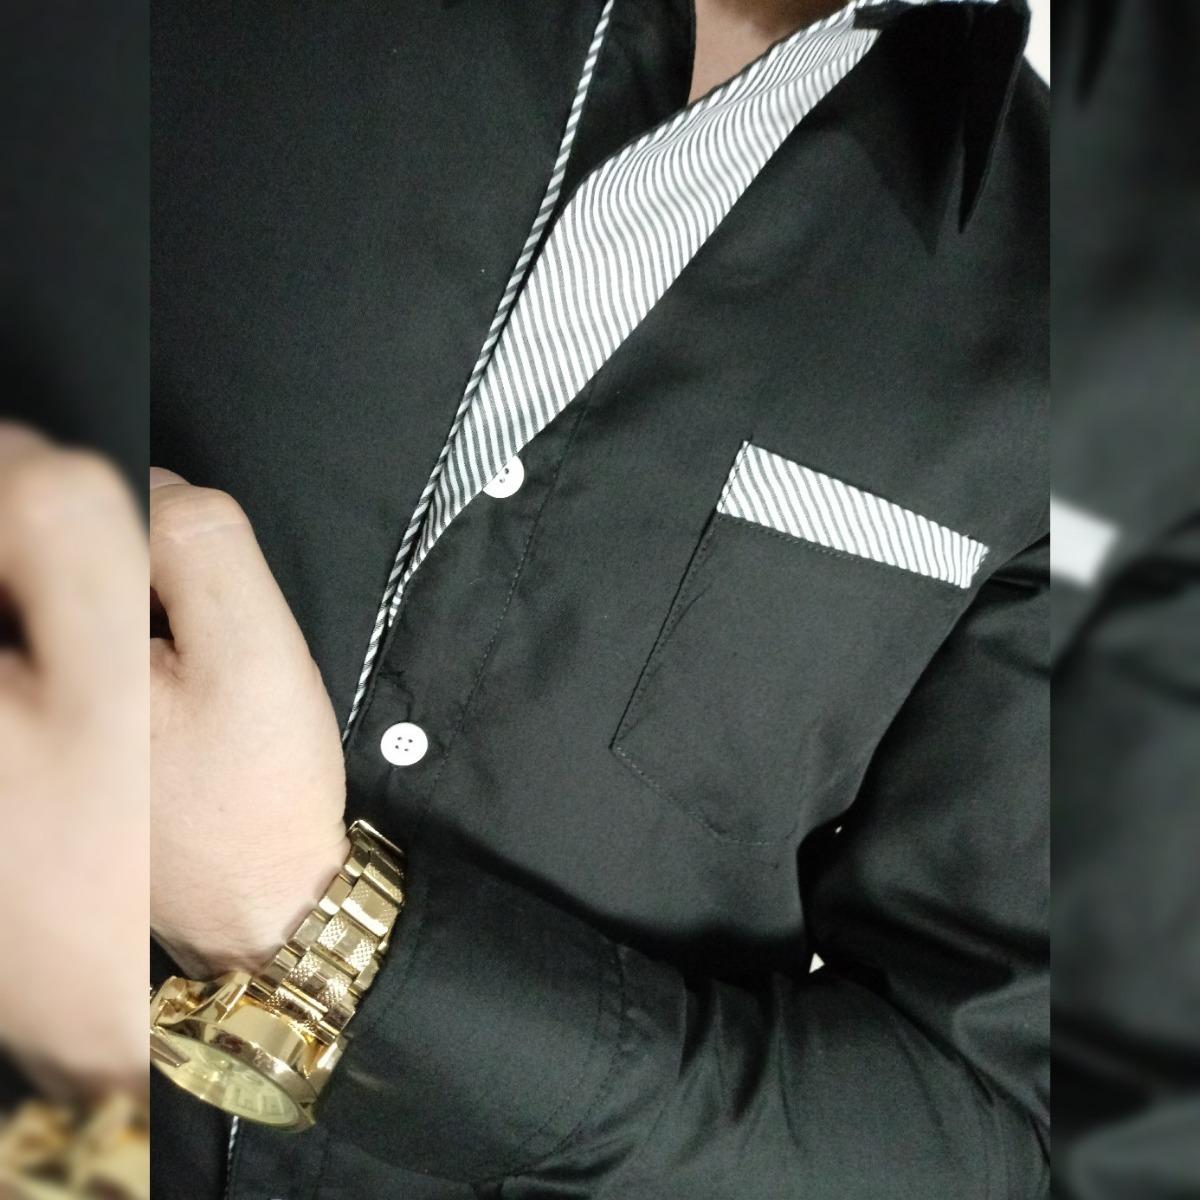 camisa social masculina manga comprida homem slim oferta! Carregando zoom. fa5c8bb61b